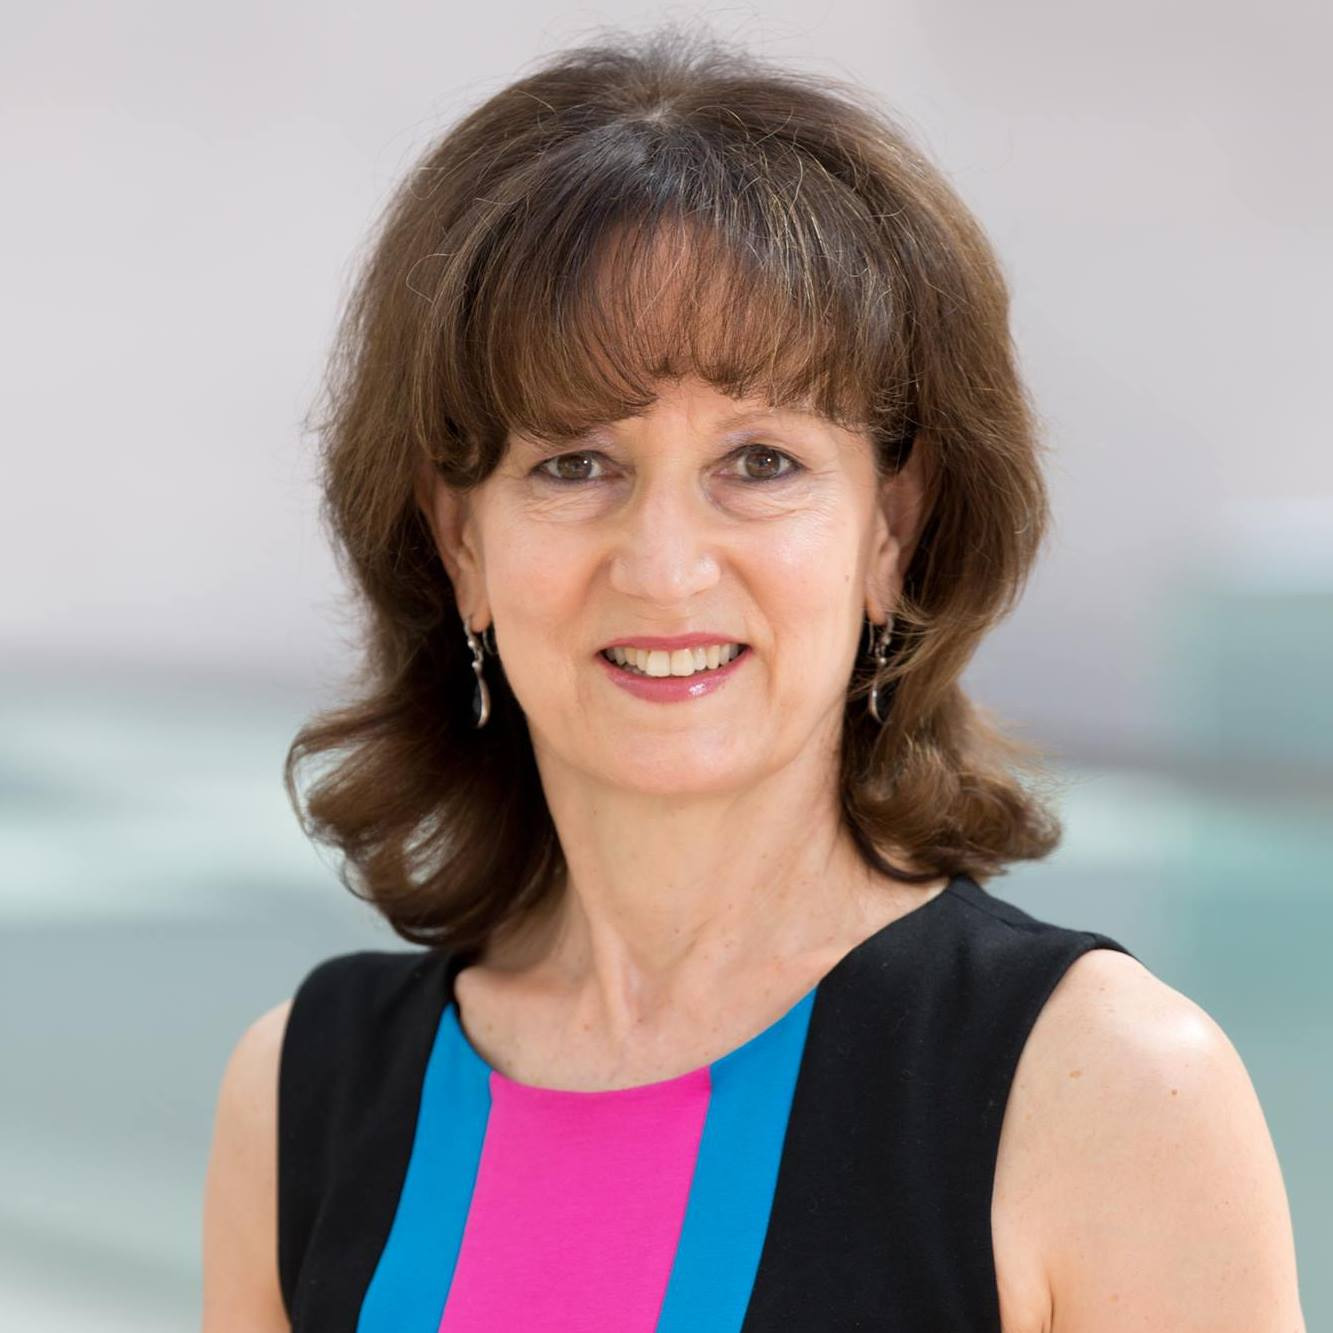 Headshot of Deborah Ziska